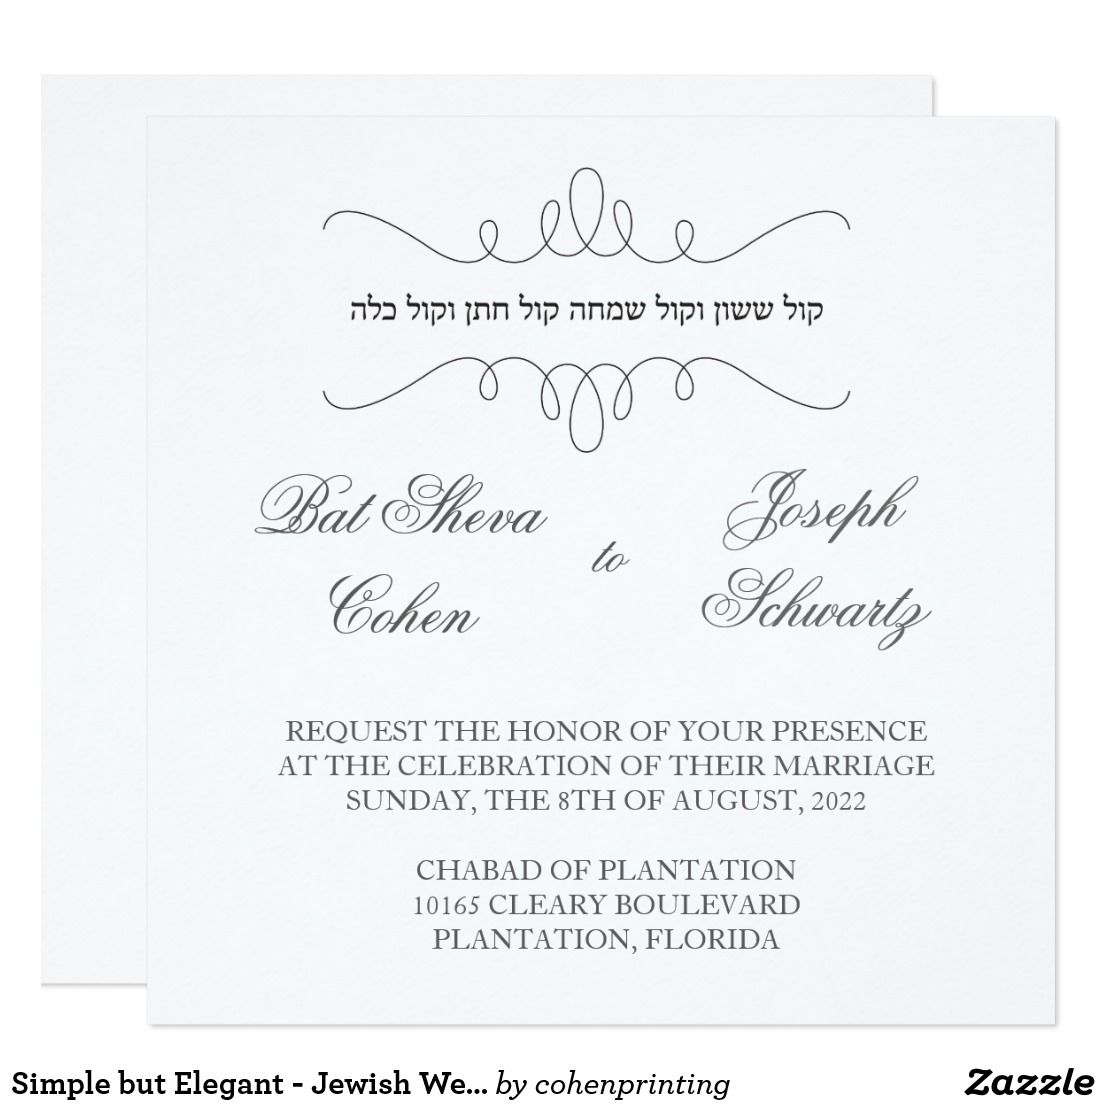 Simple but Elegant - Jewish Wedding Invitation  Zazzle.com